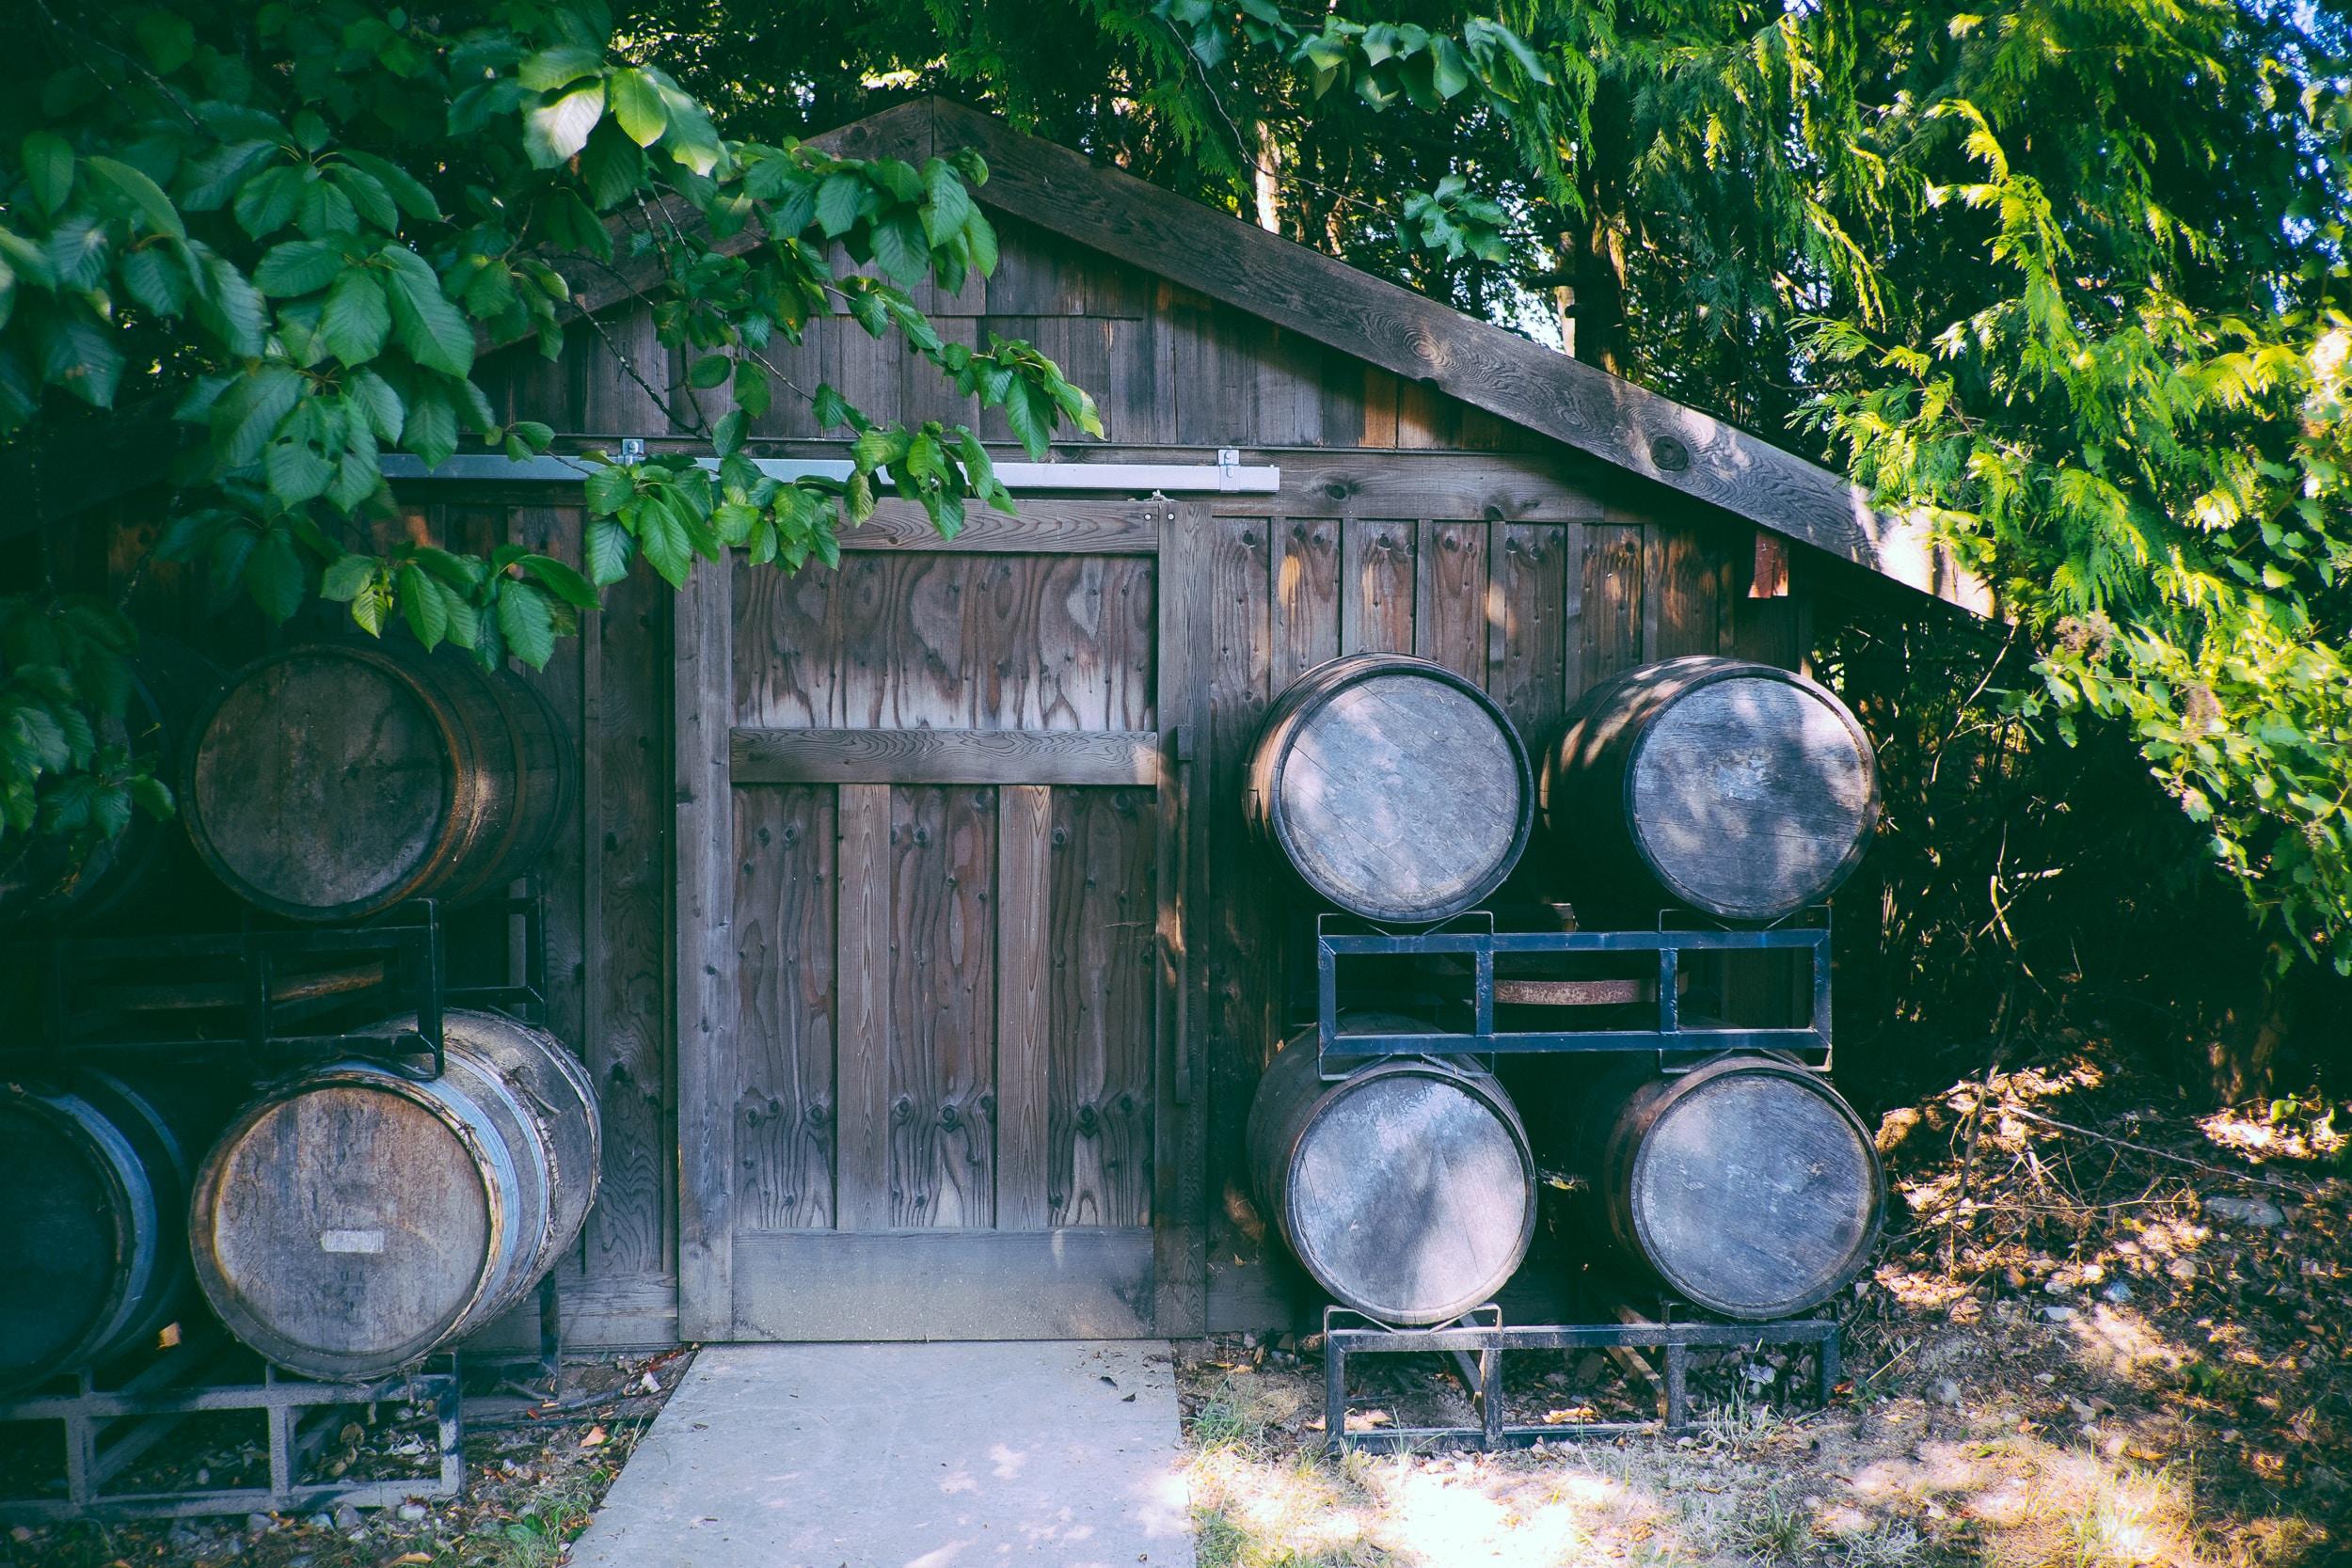 photo of barrels beside house